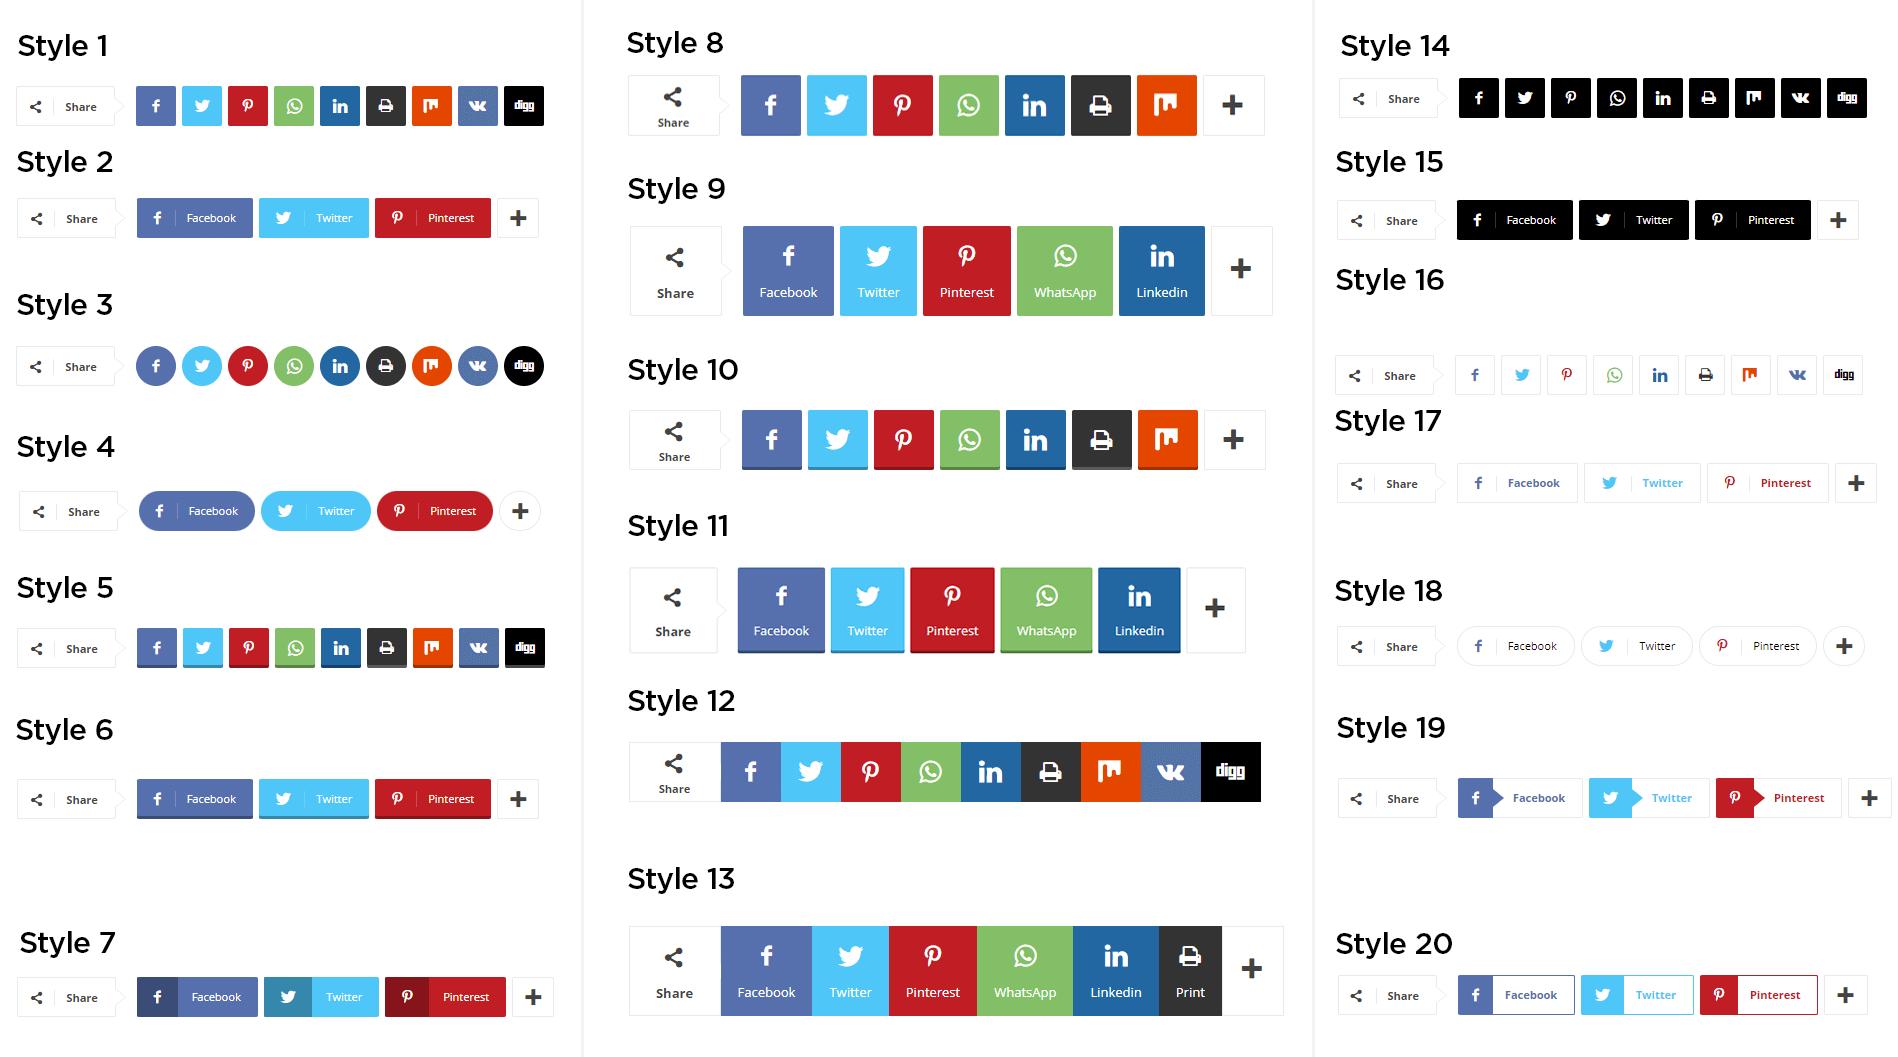 Social Sharing Styles